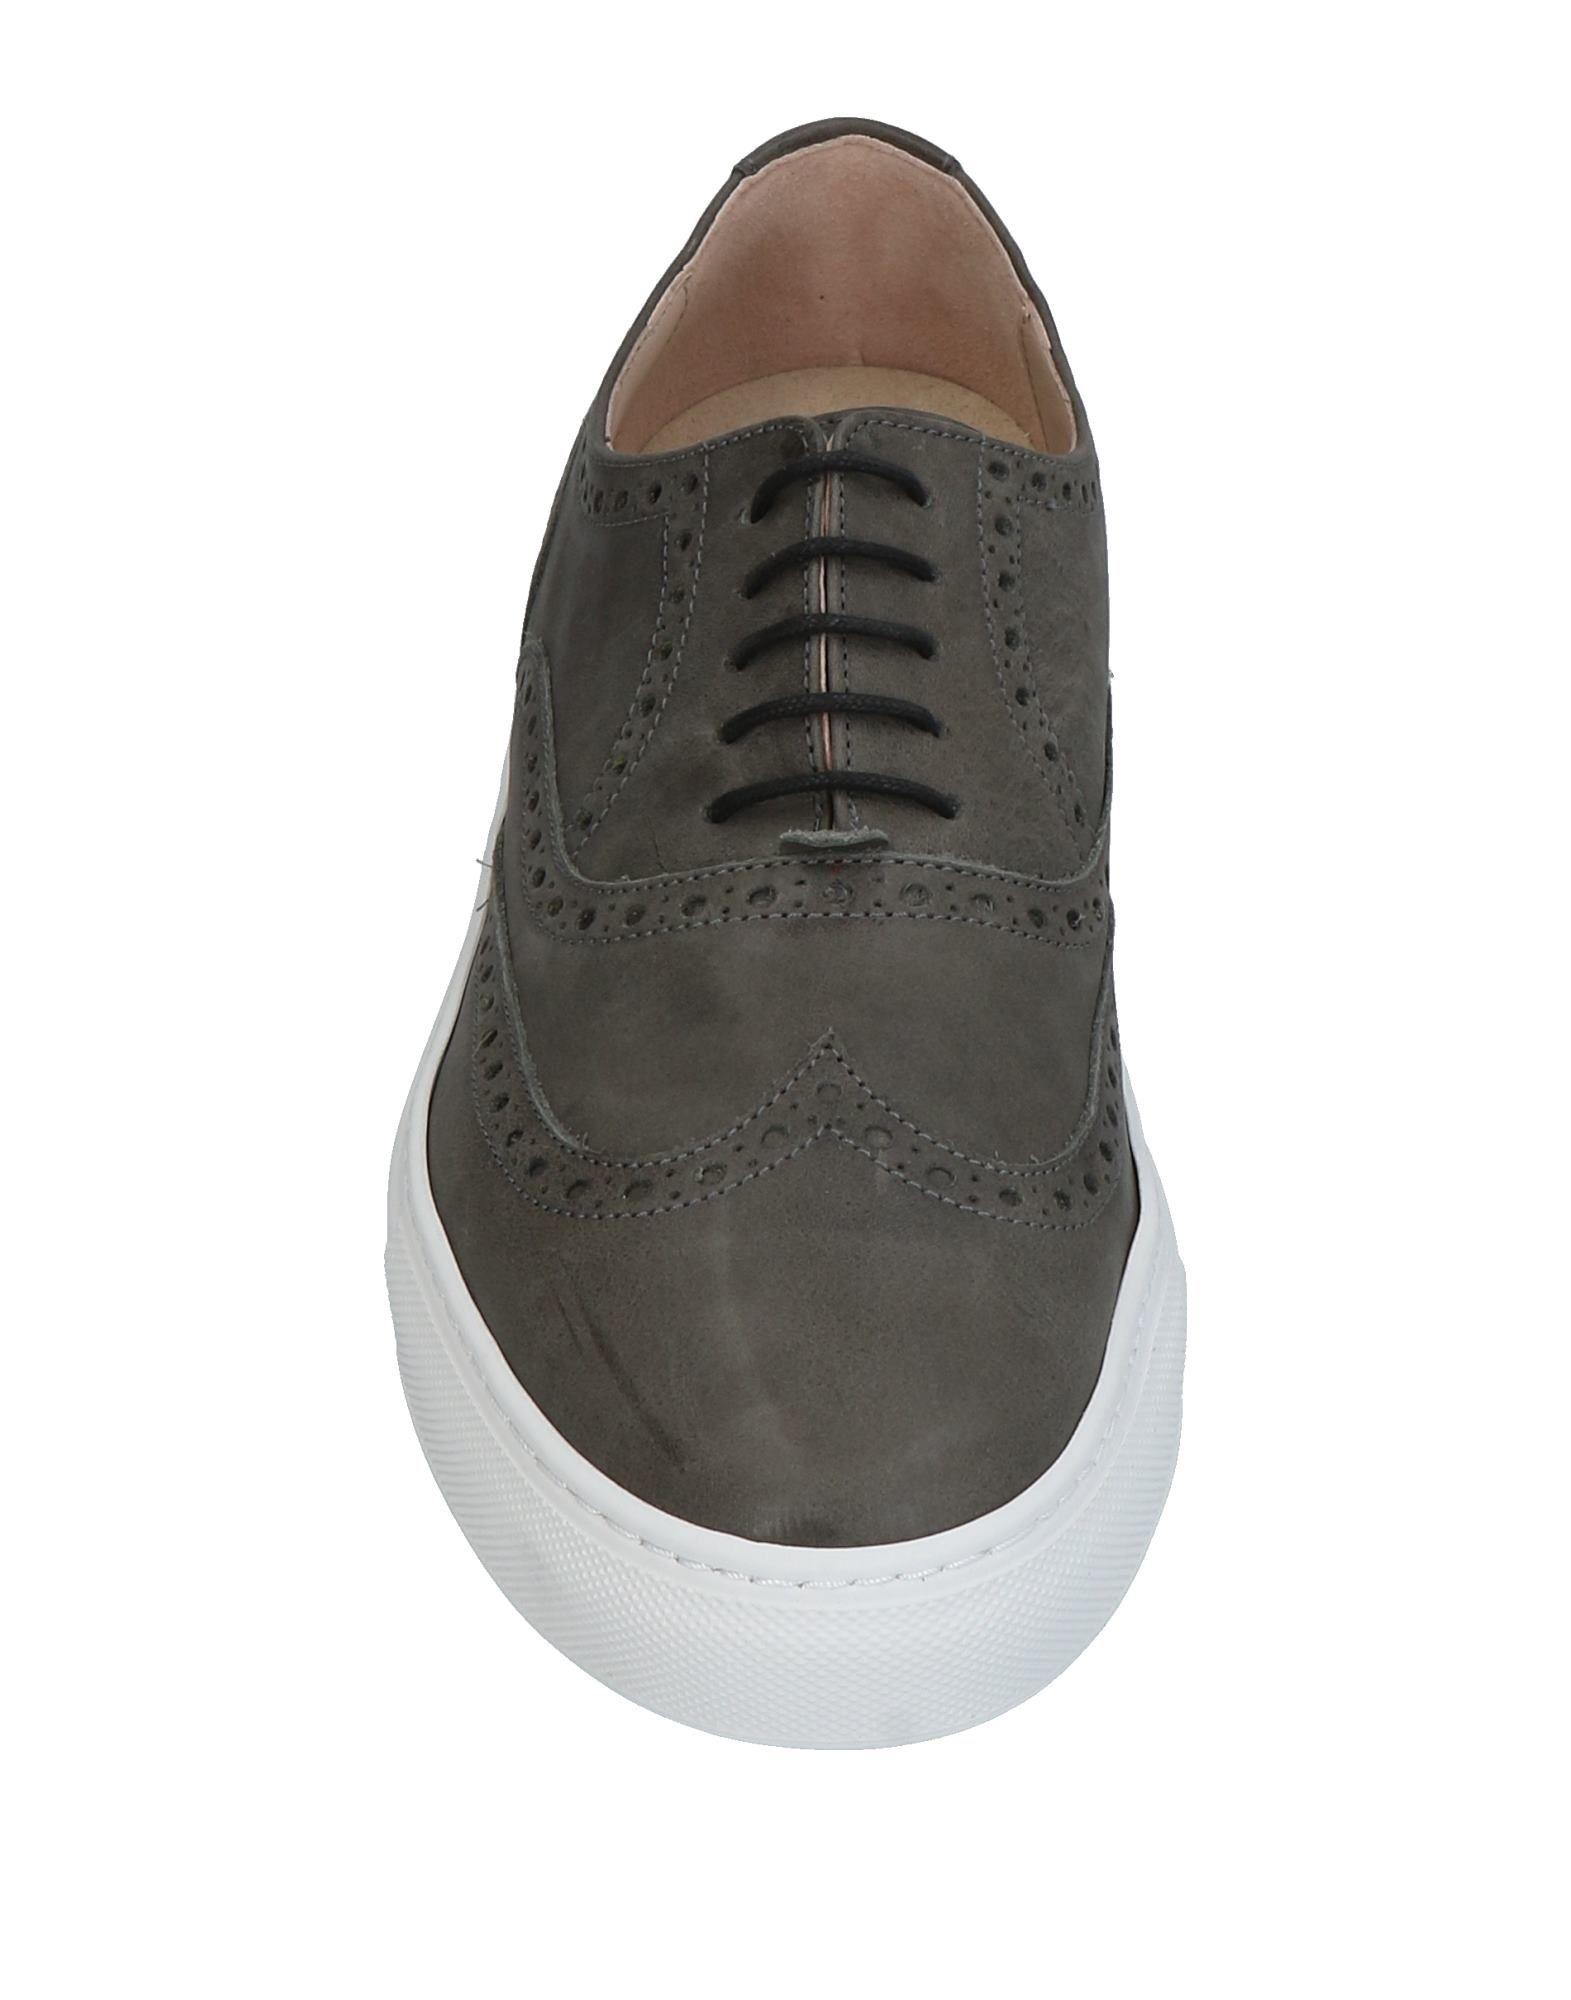 Rabatt echte Schuhe 11457091KG Quattrobarradodici Sneakers Herren  11457091KG Schuhe 24716d